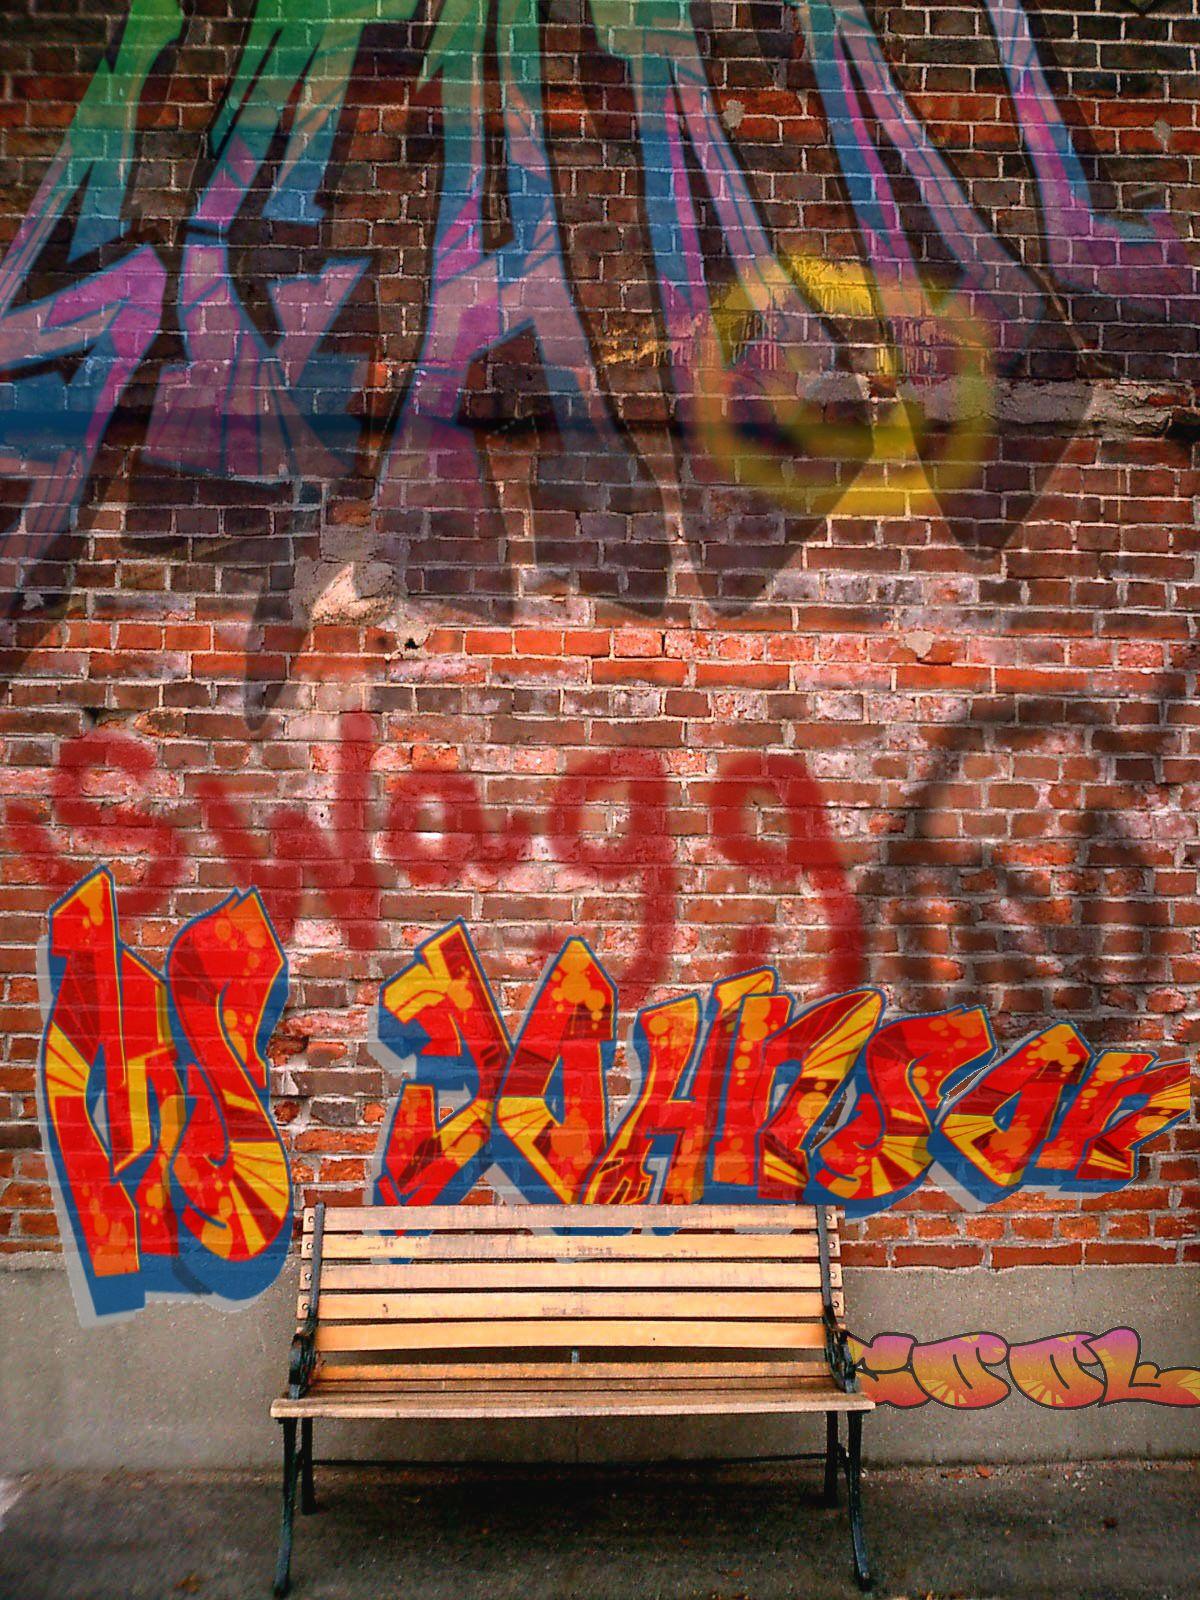 Artful Artsy Amy Lesson Plan Creating Digital Graffiti Great Resources